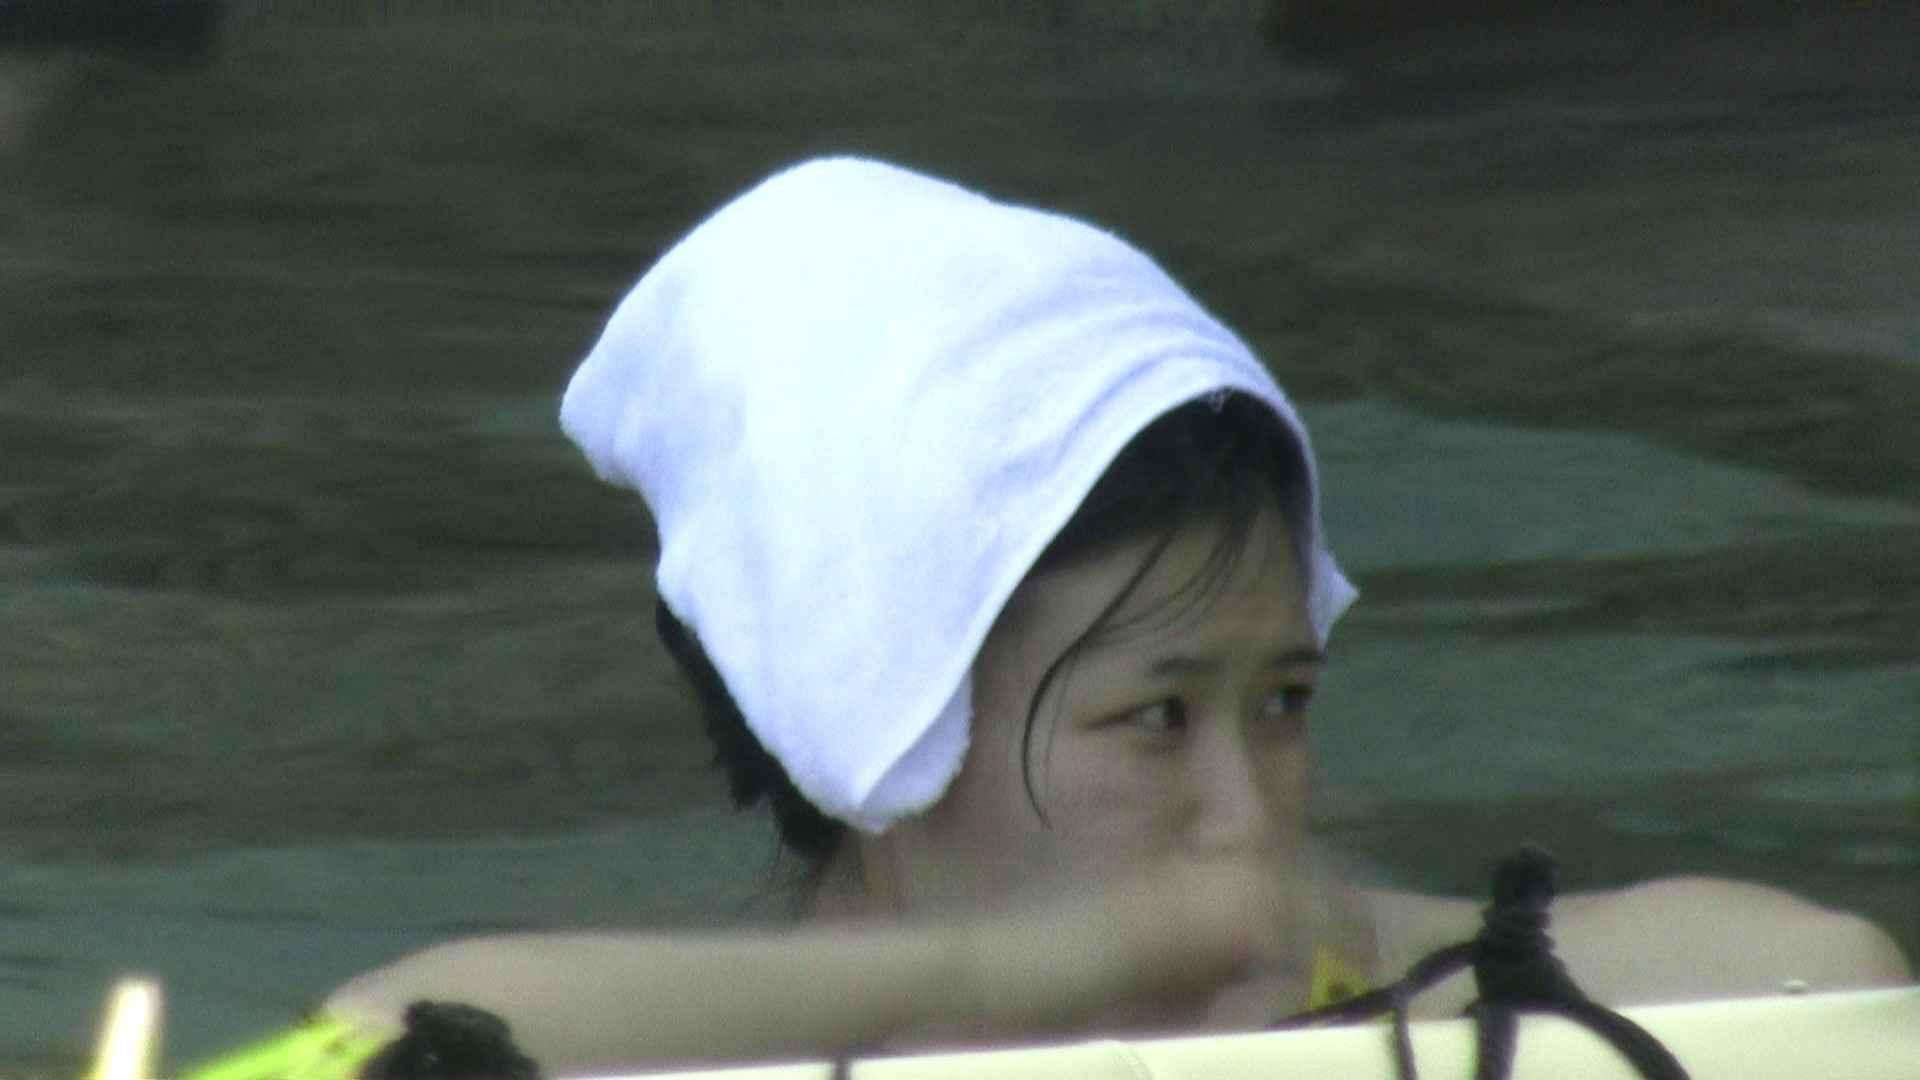 Aquaな露天風呂Vol.183 露天風呂編 | 盗撮シリーズ  104PIX 45